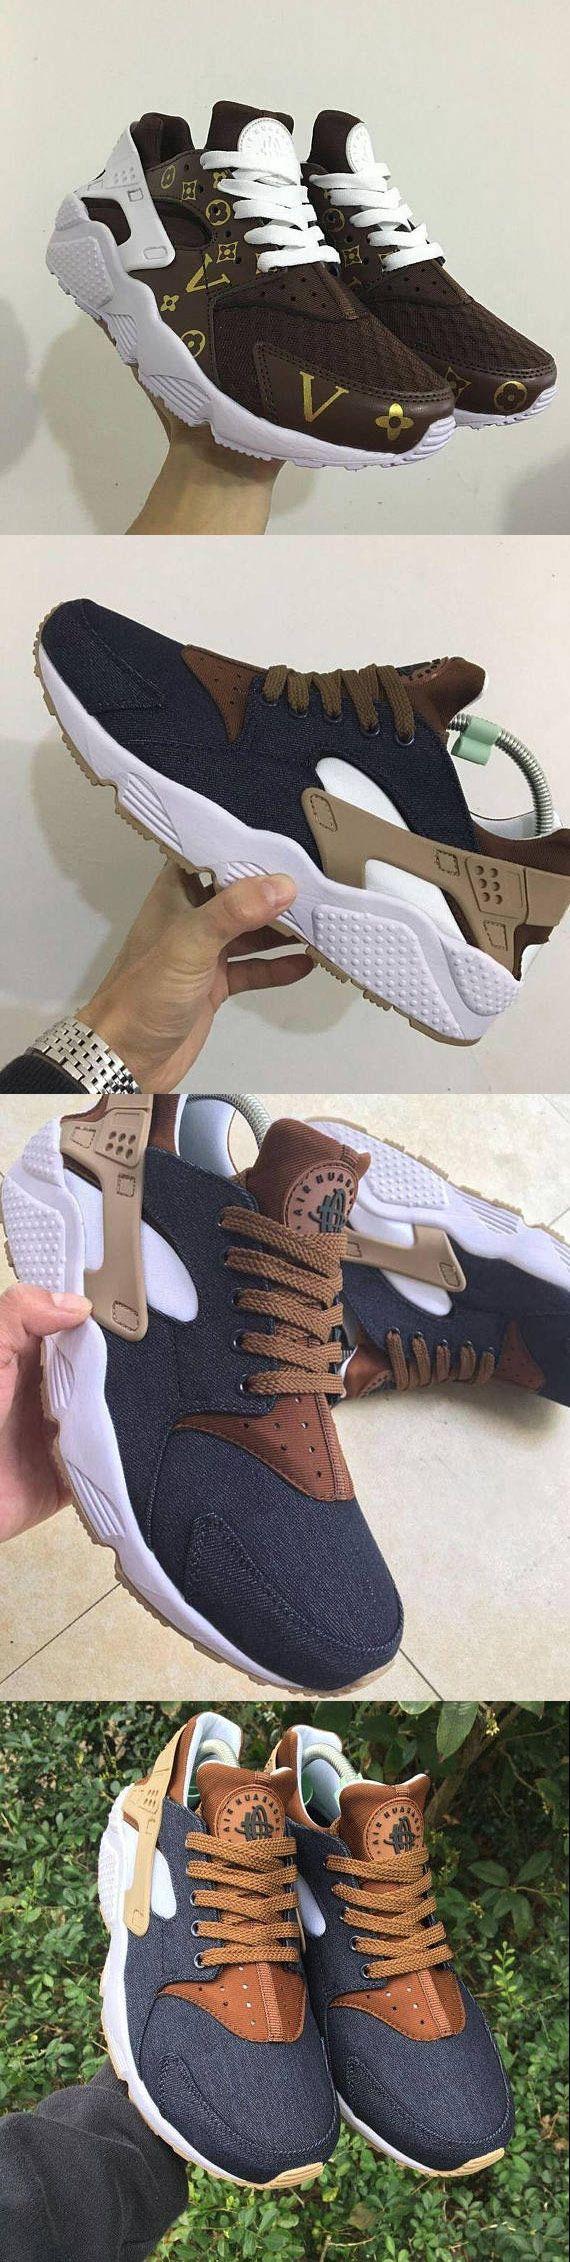 75a1a531263a Custom Nike Huarache Sneakers Hand Painted Embroidered Shoes Louis Vuitton  Supreme Bape Champion